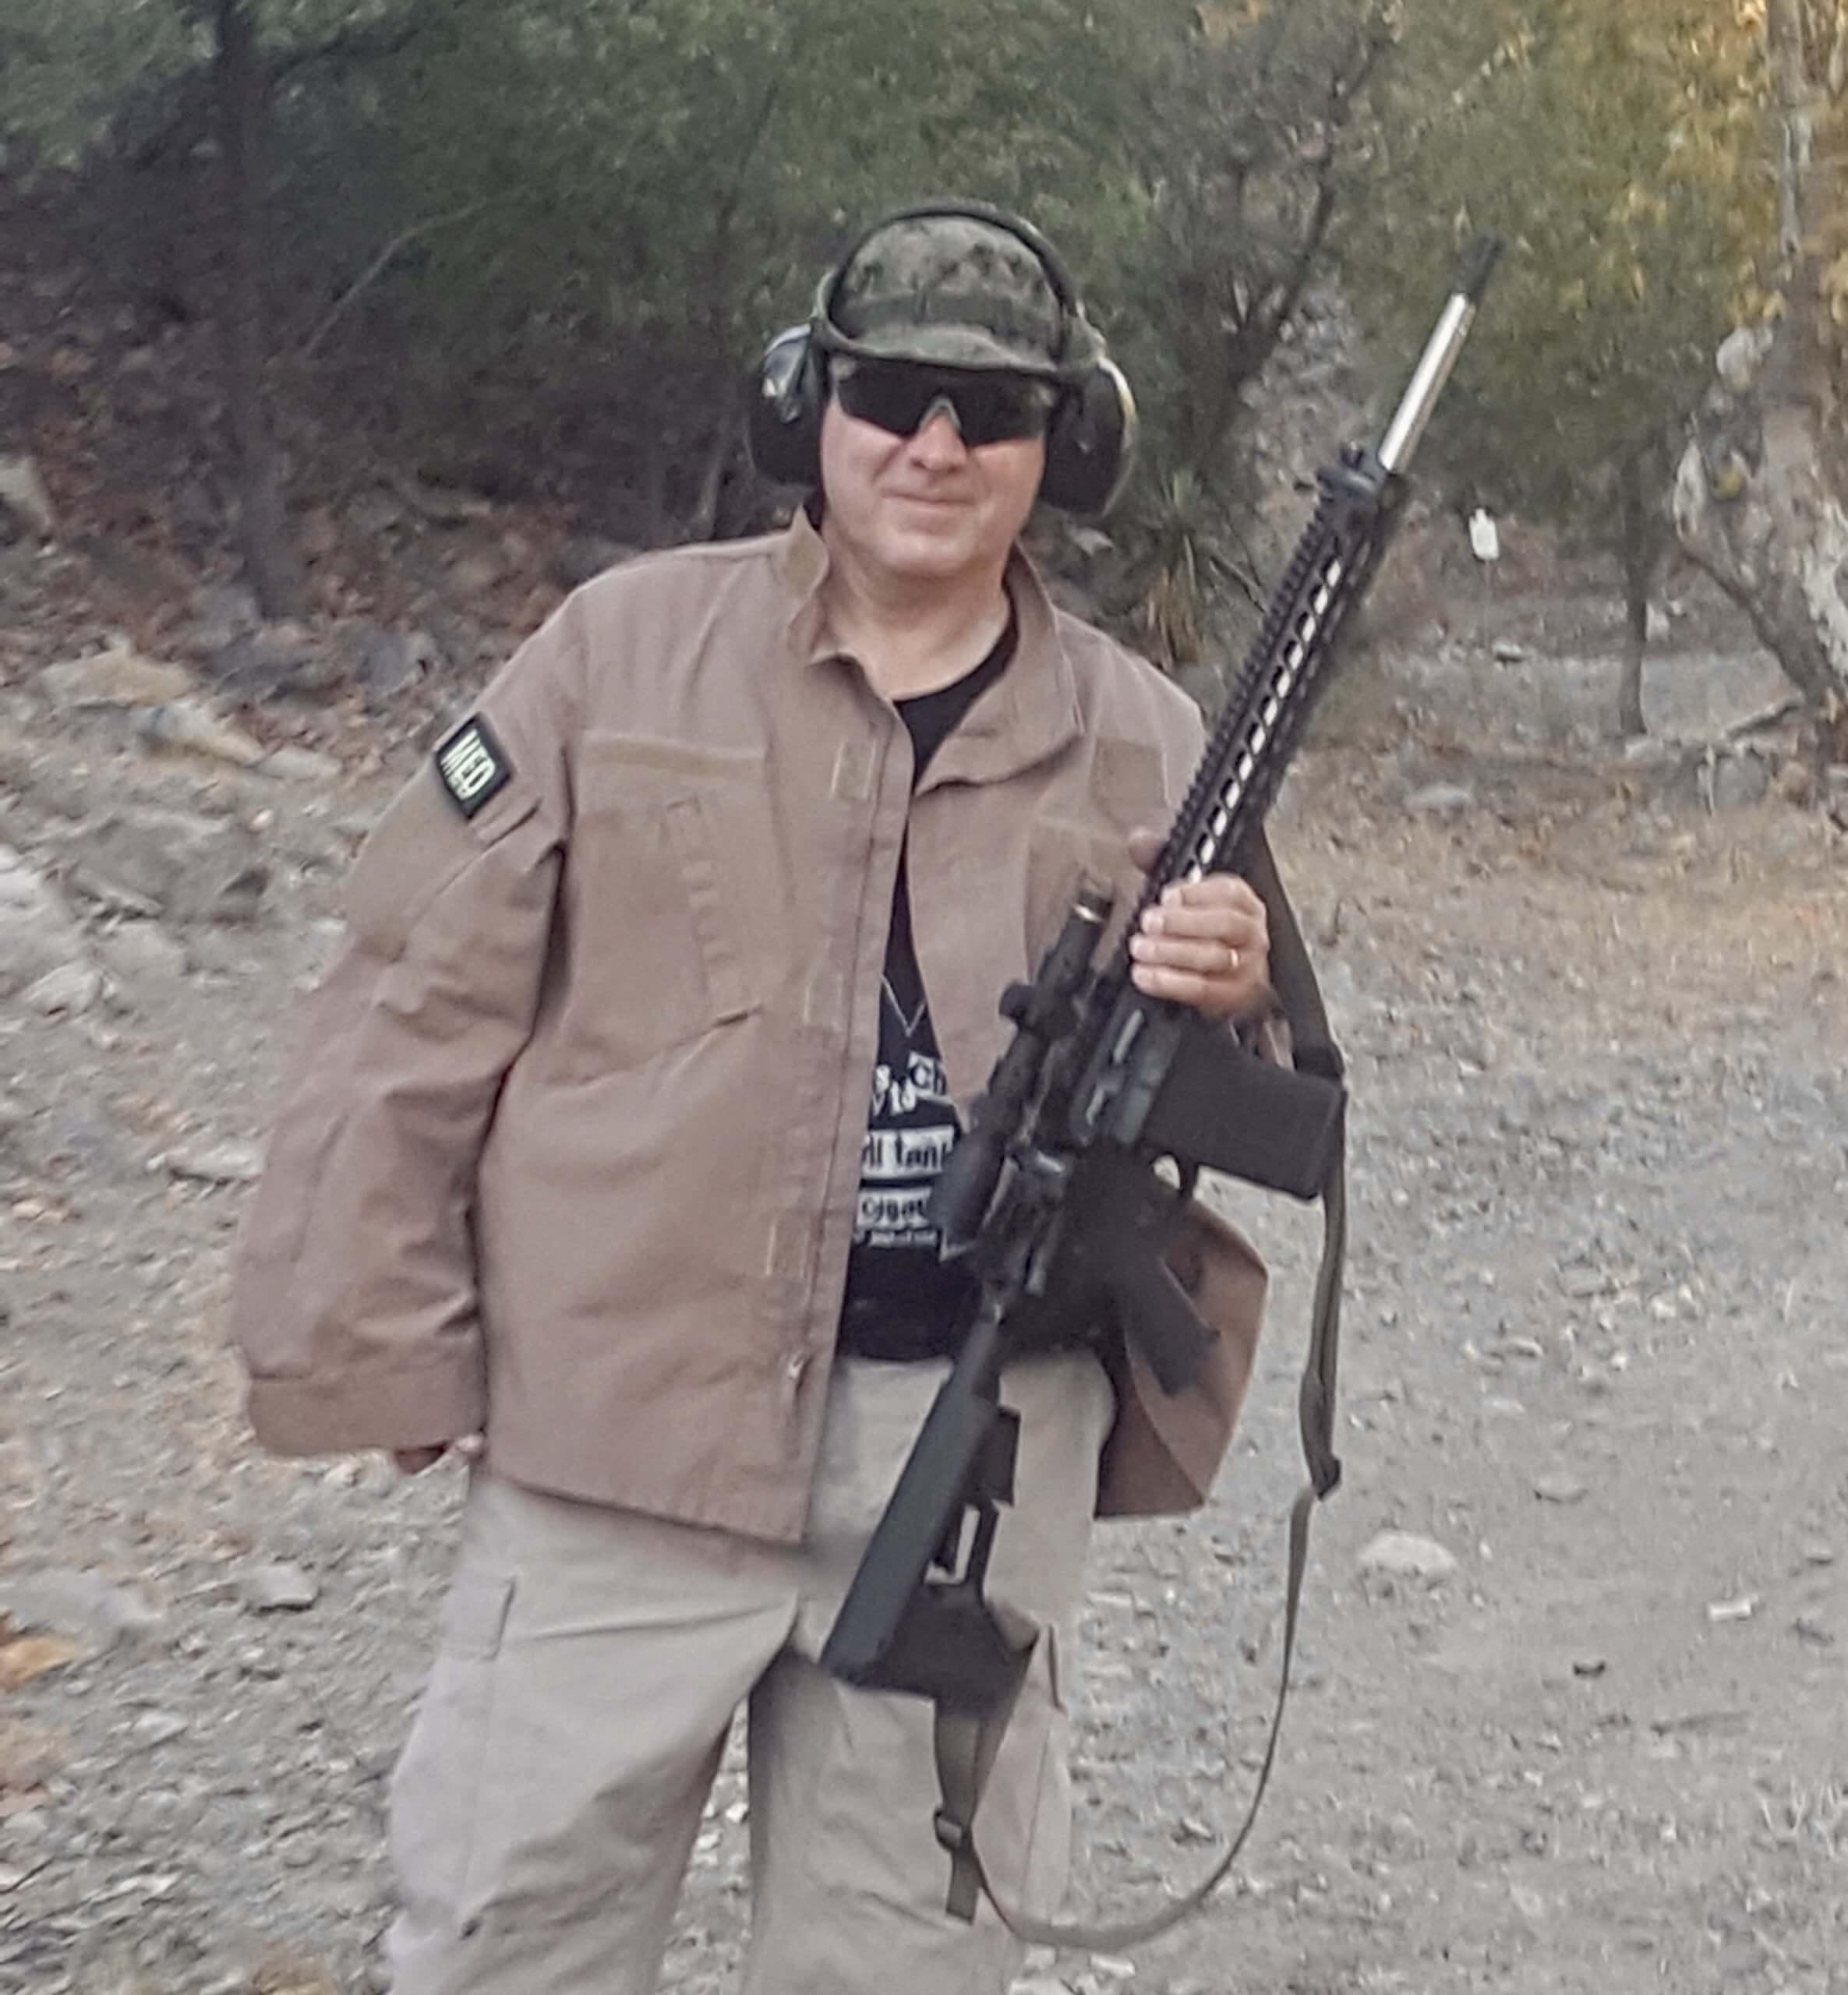 ASR Rifles and ASR Med Kits